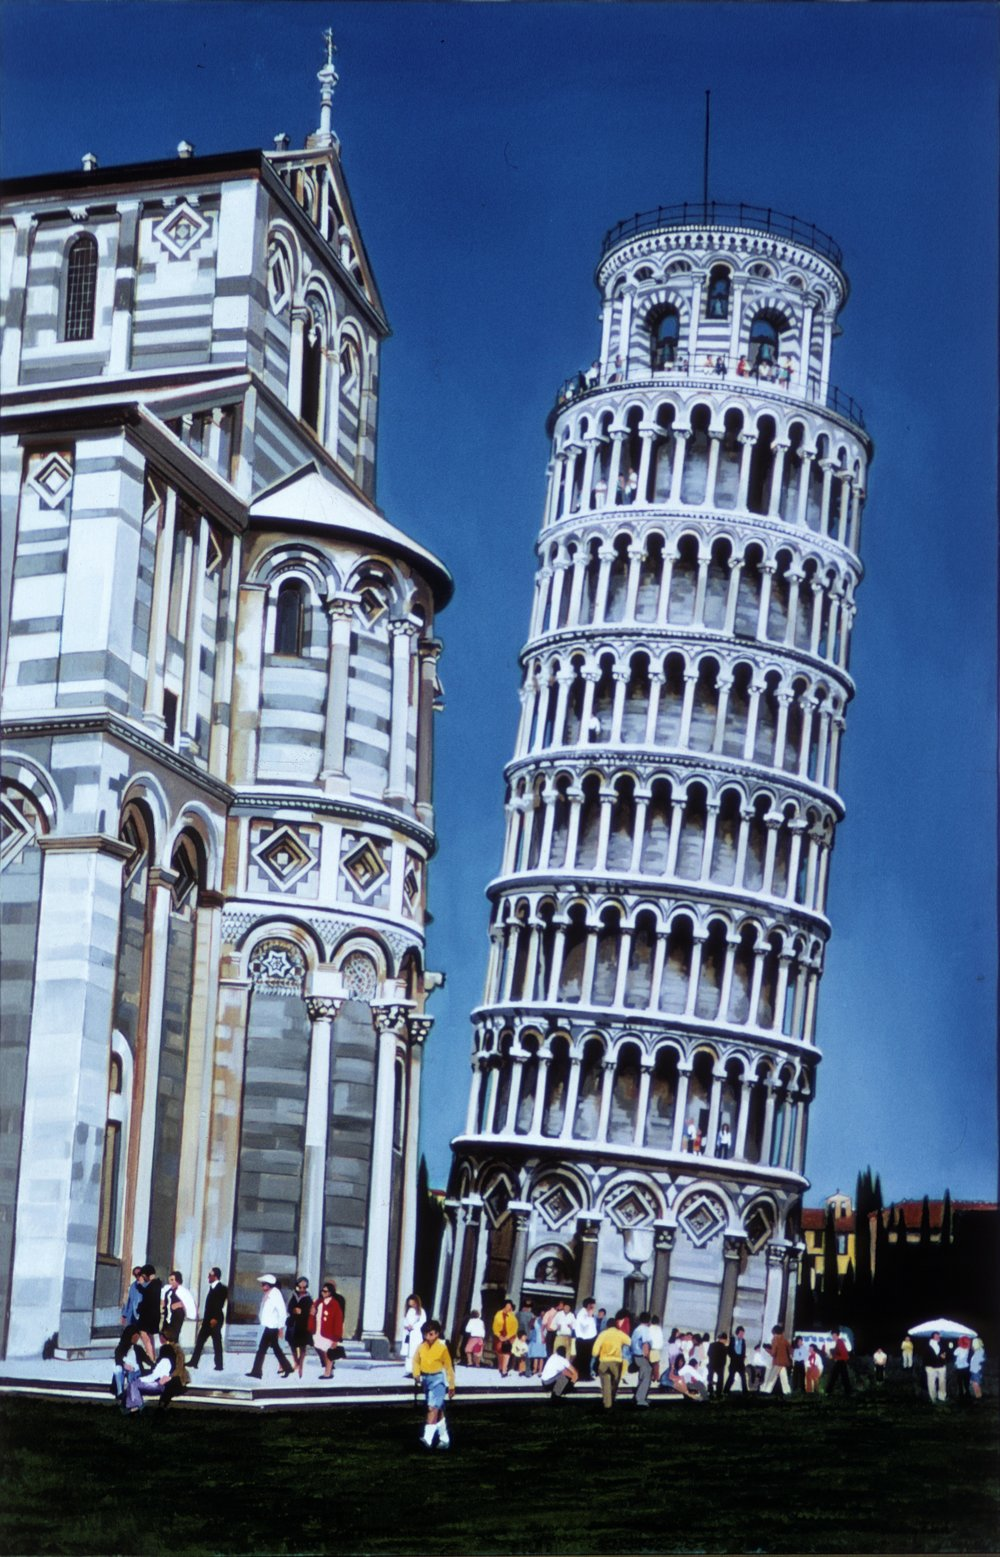 Flack_Tower of Pisa_1971_oil on canvas.jpg